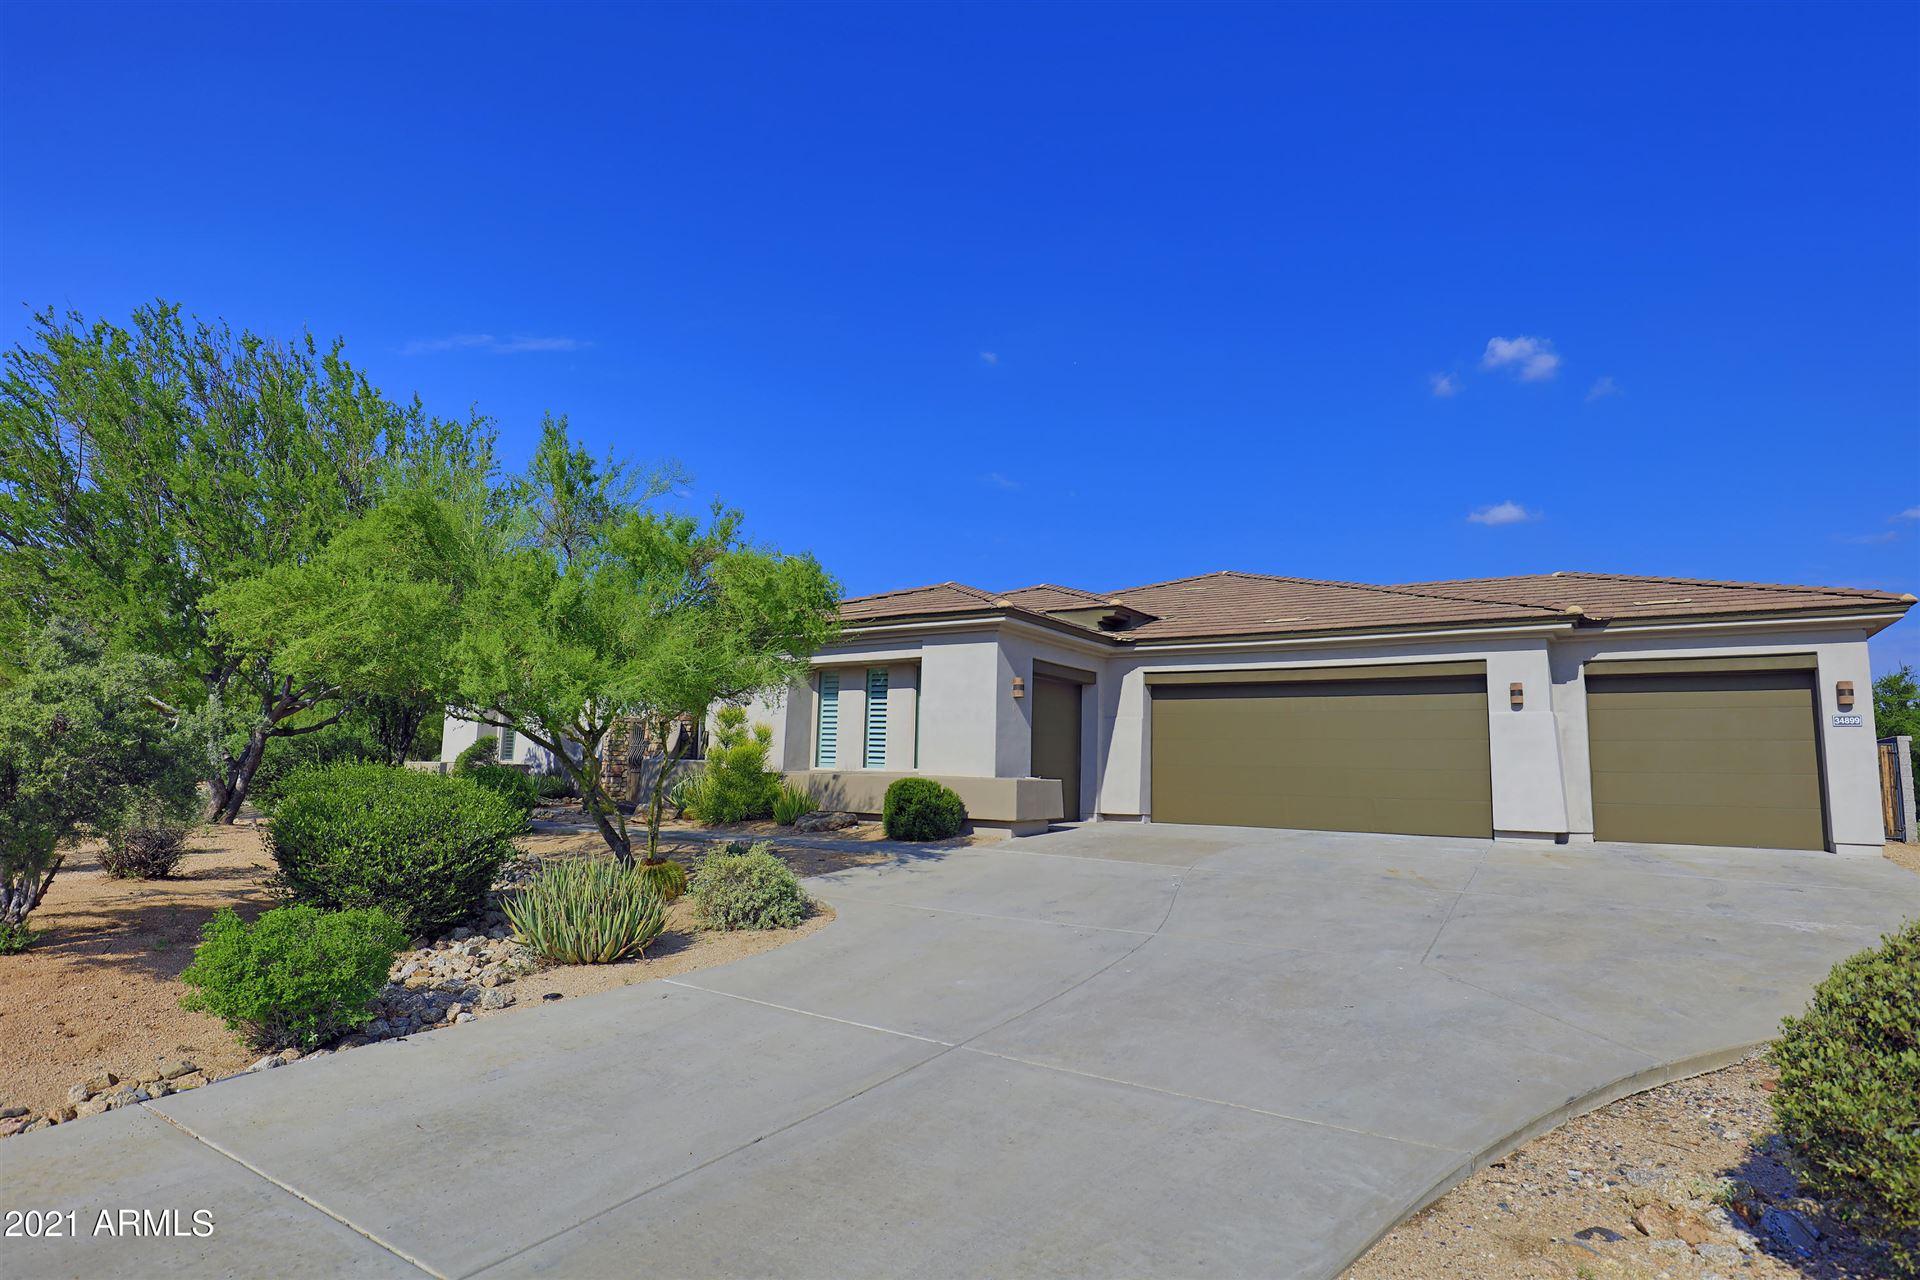 Photo of 34899 N DESERT WINDS Circle, Carefree, AZ 85377 (MLS # 6279446)